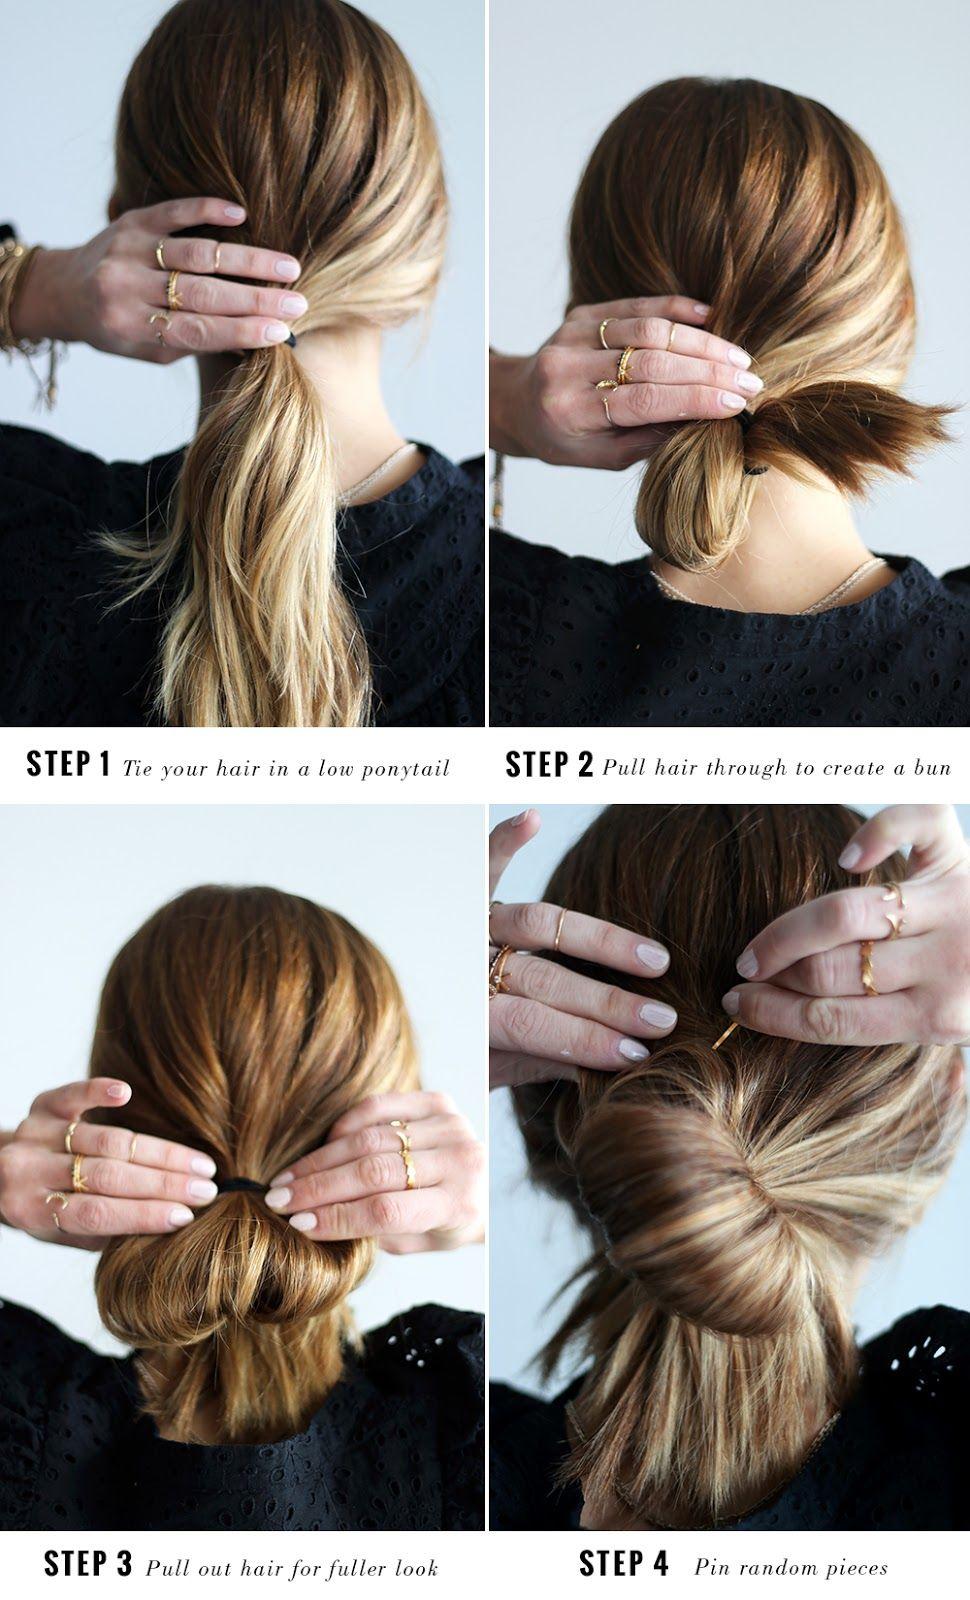 Diy File Easy Messy Bun Tutorial The Vault Files Bun Tutorial Messy Hairstyles Messy Bun Hairstyles